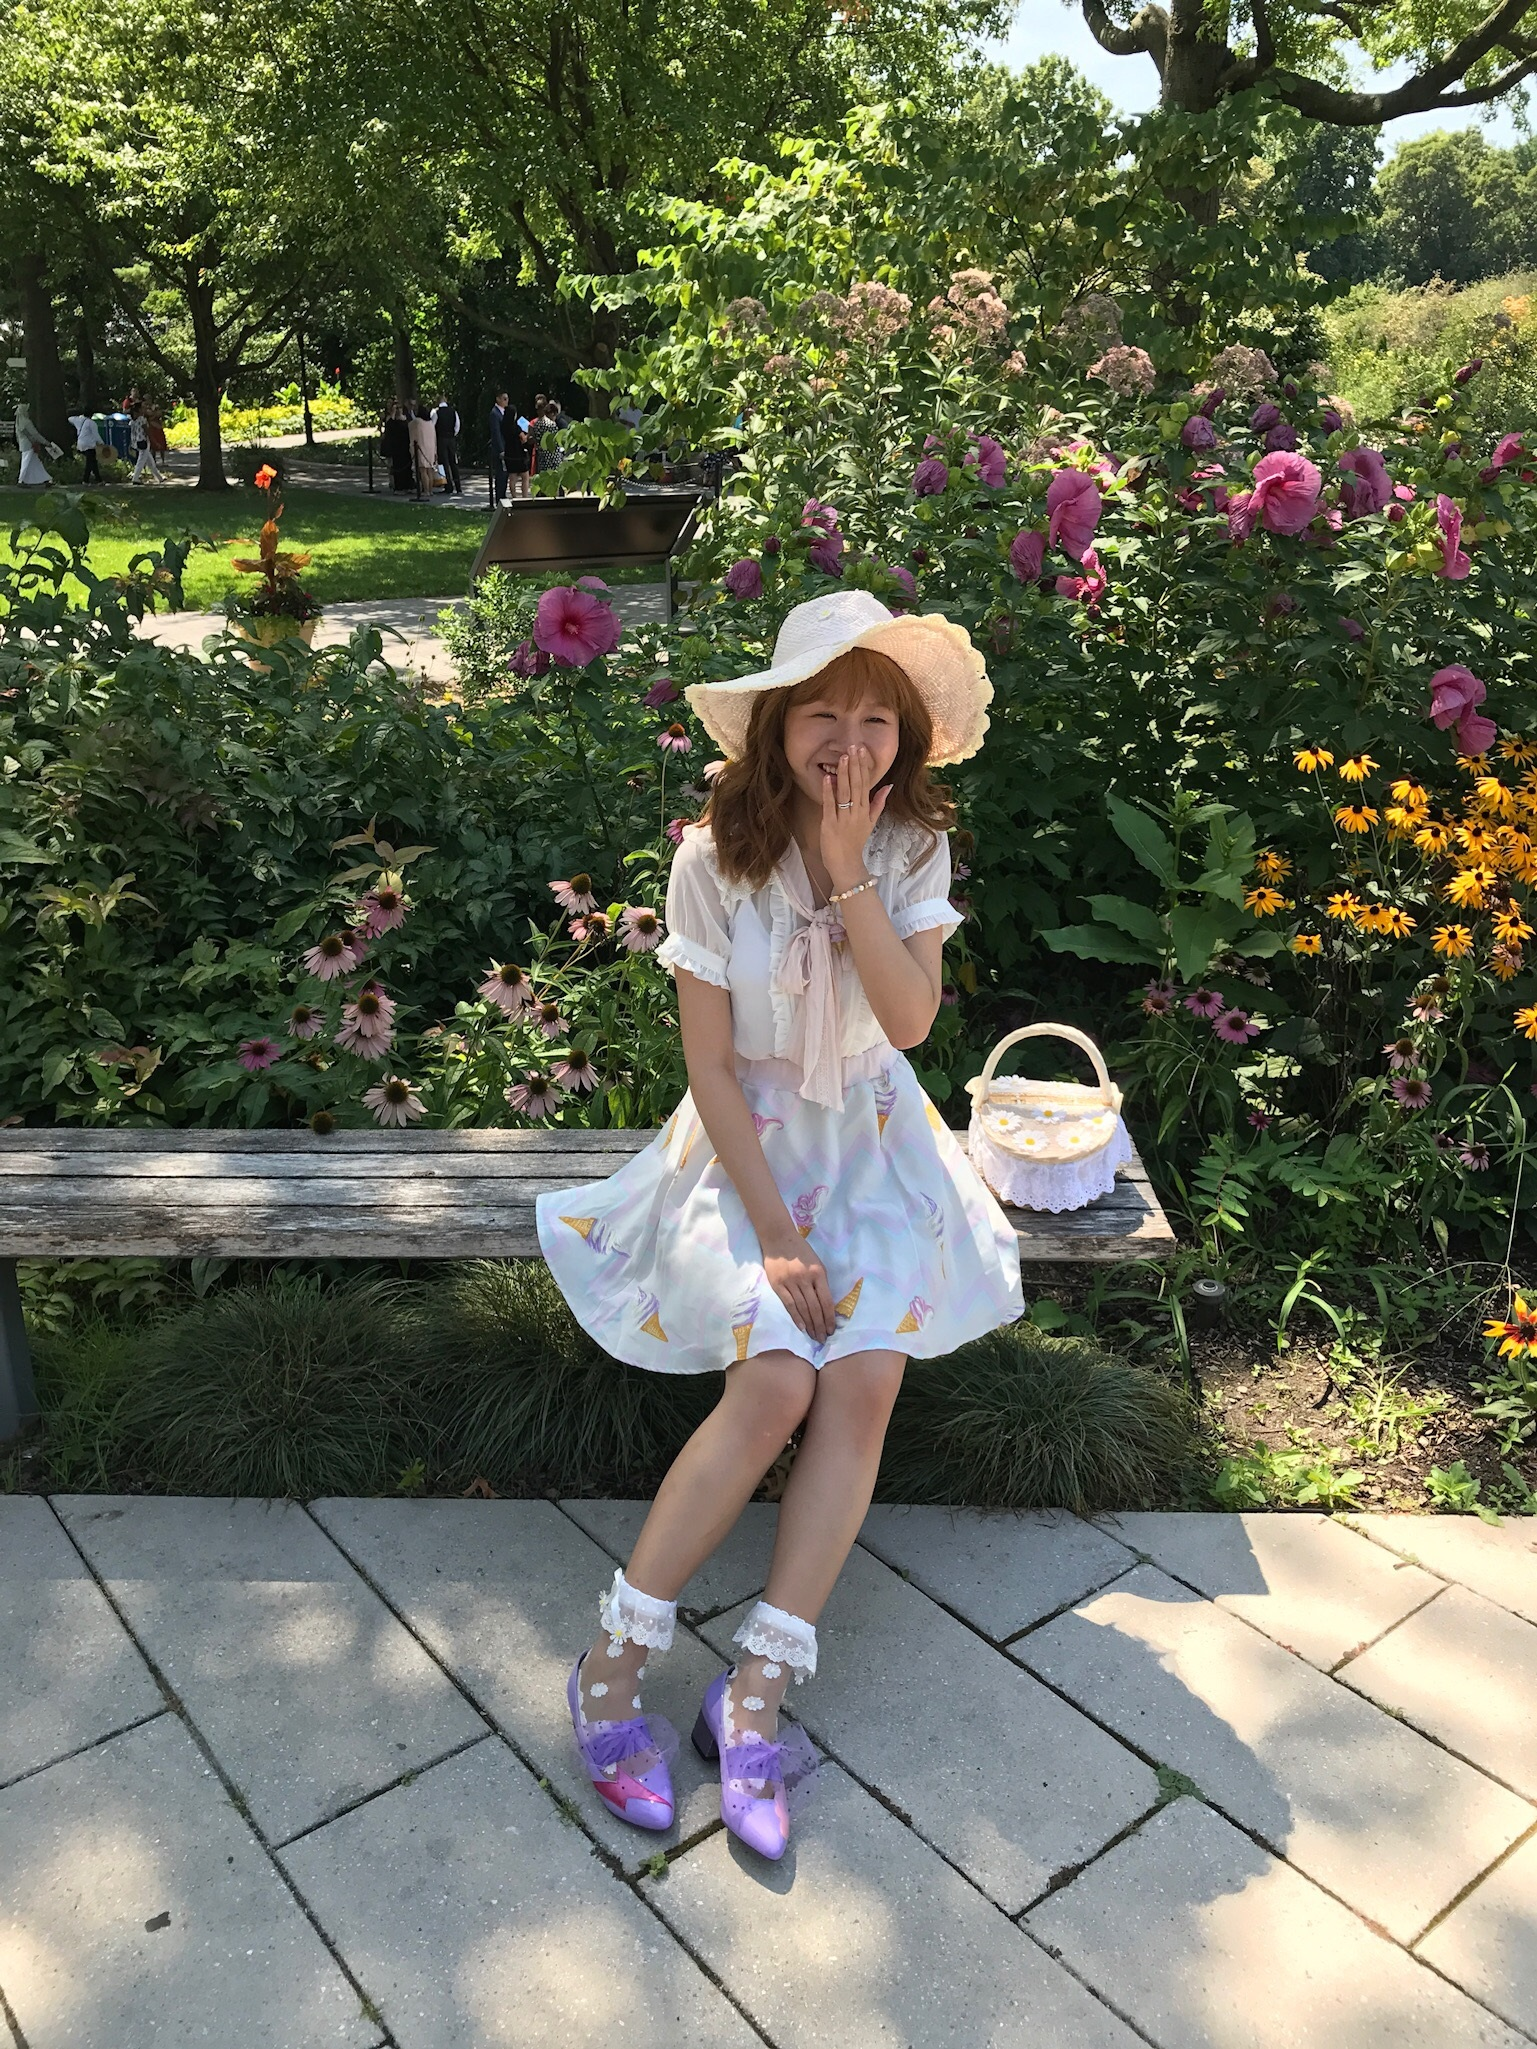 Top: LIZ LISA; skirt: MILK; bag: LIZ LISA: shoes: MILK: hat: LIZ LISA.